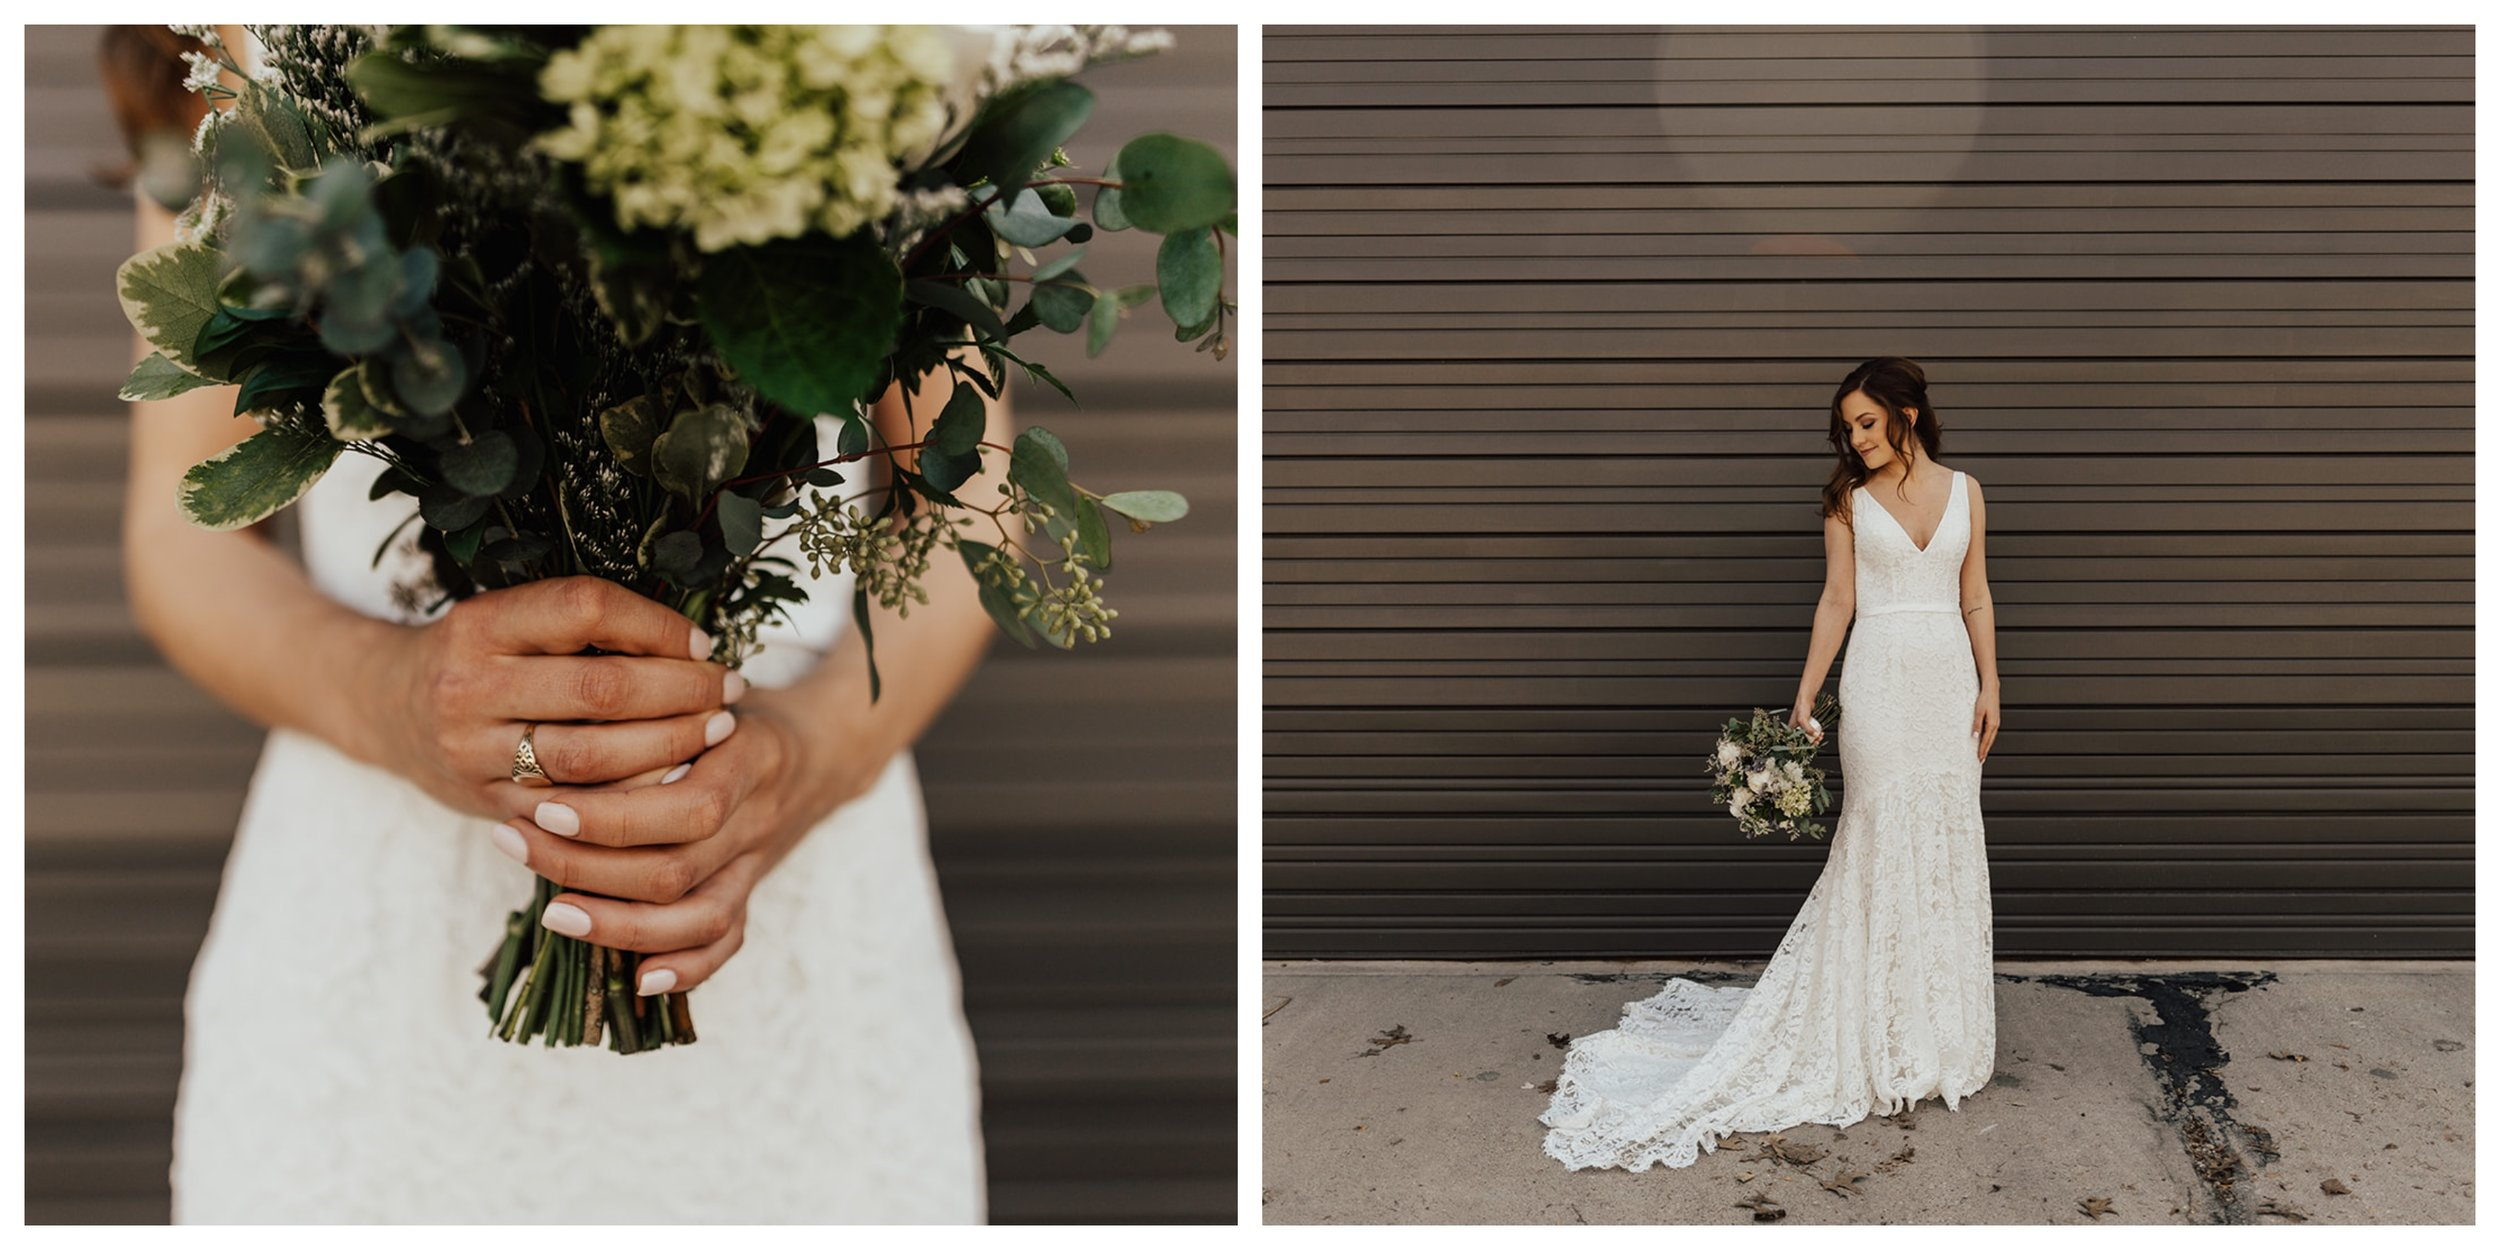 Lis Simon Bridal Gowns_Midwest